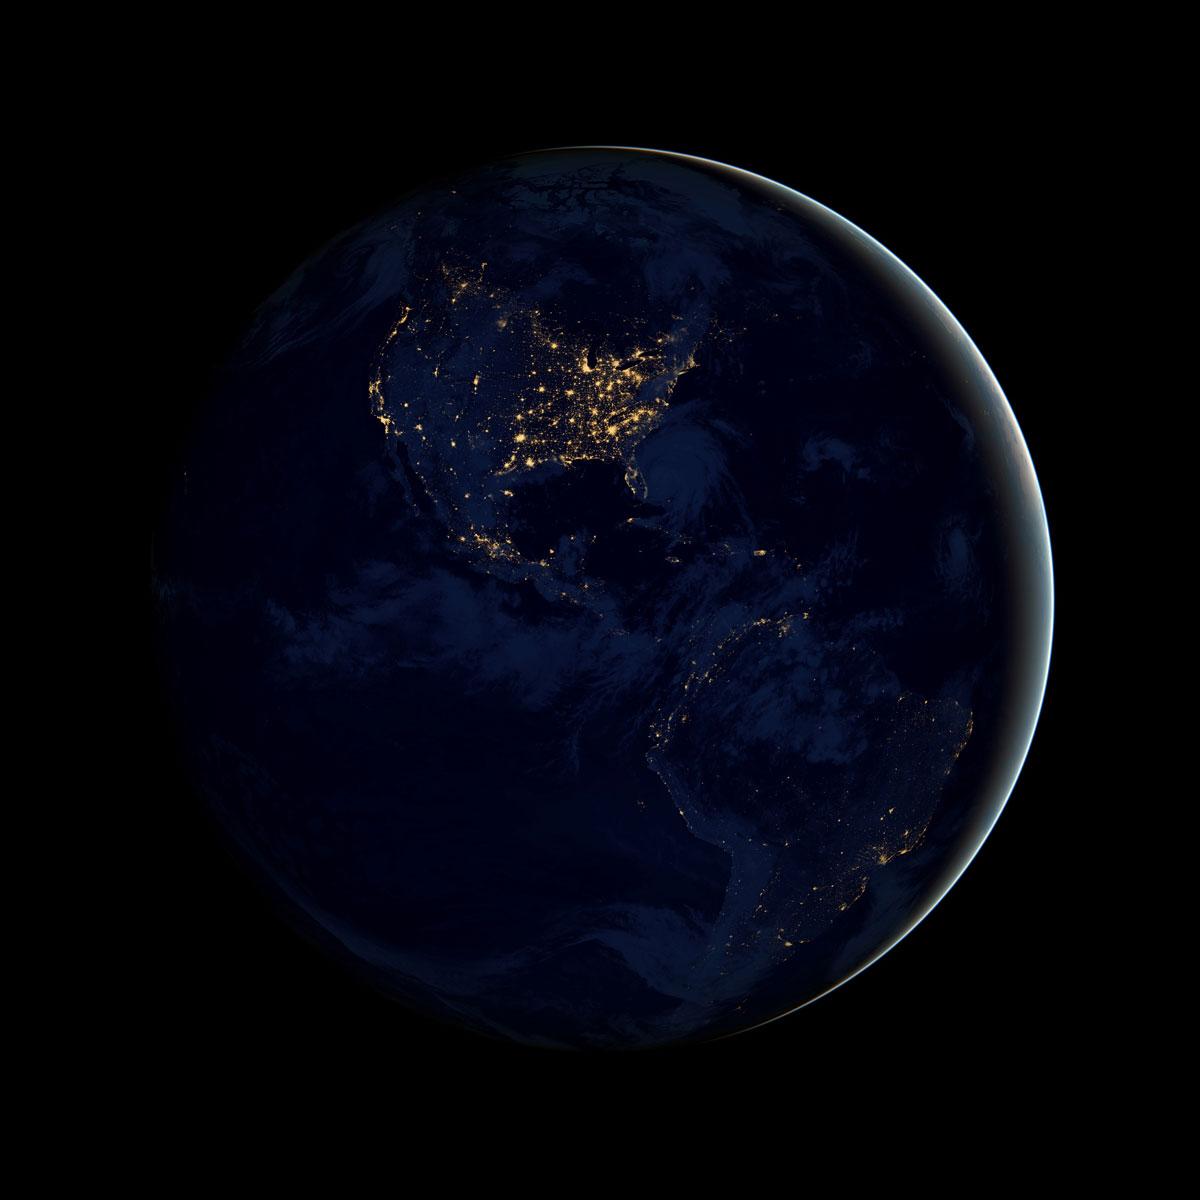 nasa earth day gallery (20)